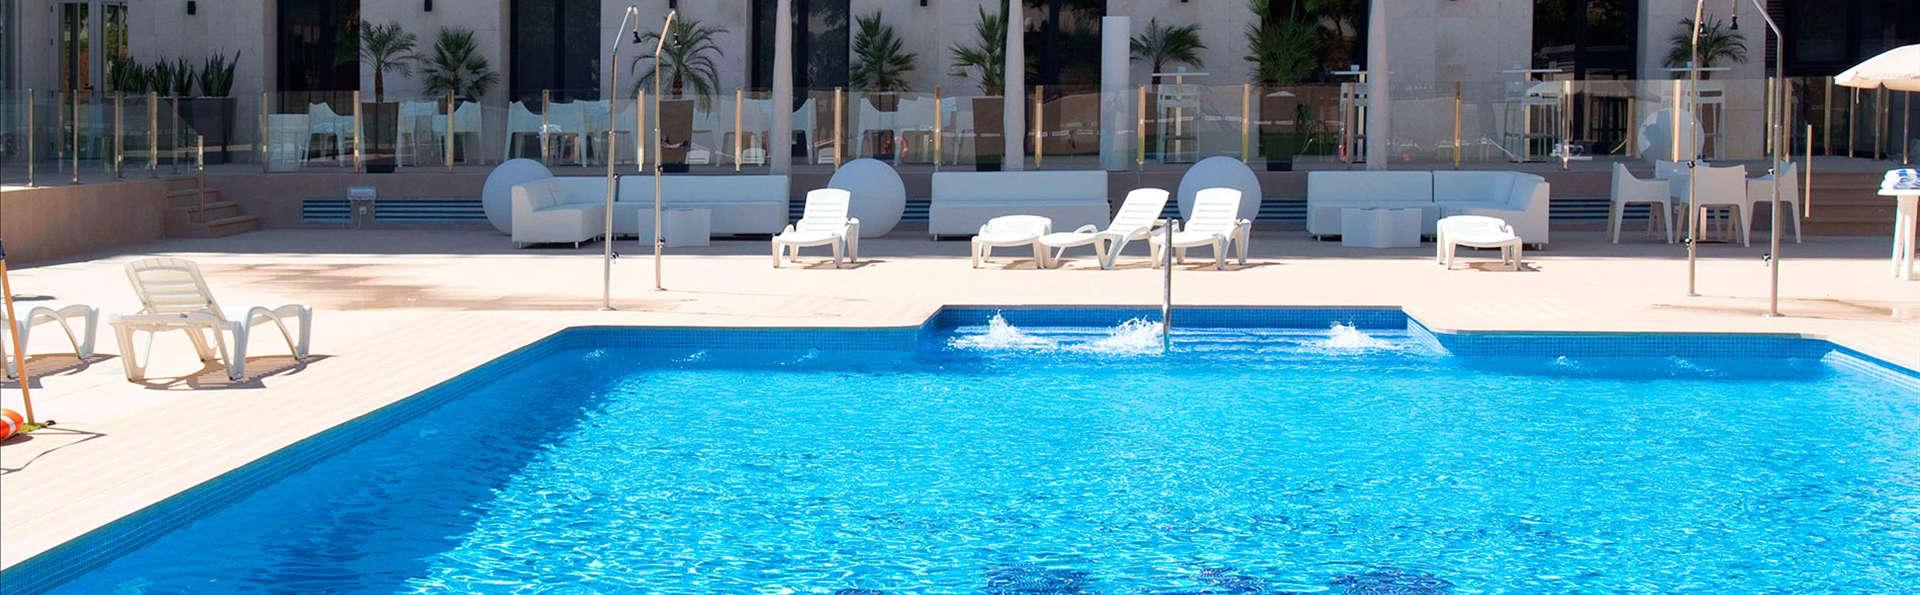 Hotel M.A. Sevilla Congresos - EDIT_pool.jpg